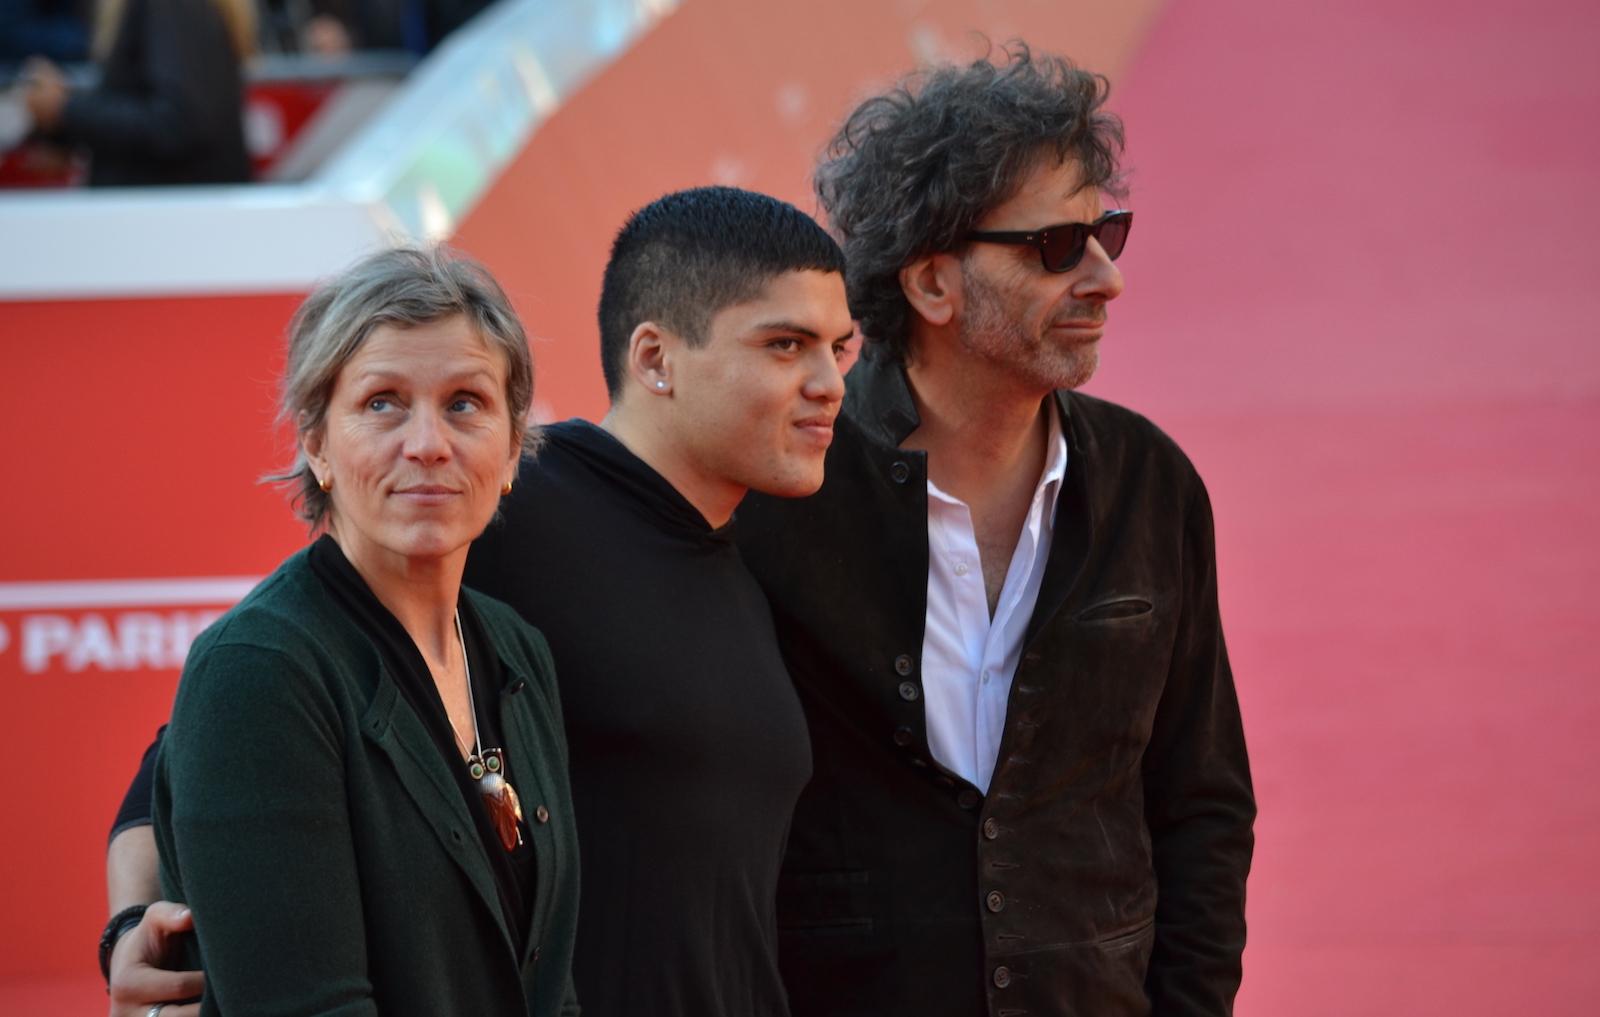 Roma 2015: Frances McDormand e Joel Coen posano sul red carpet